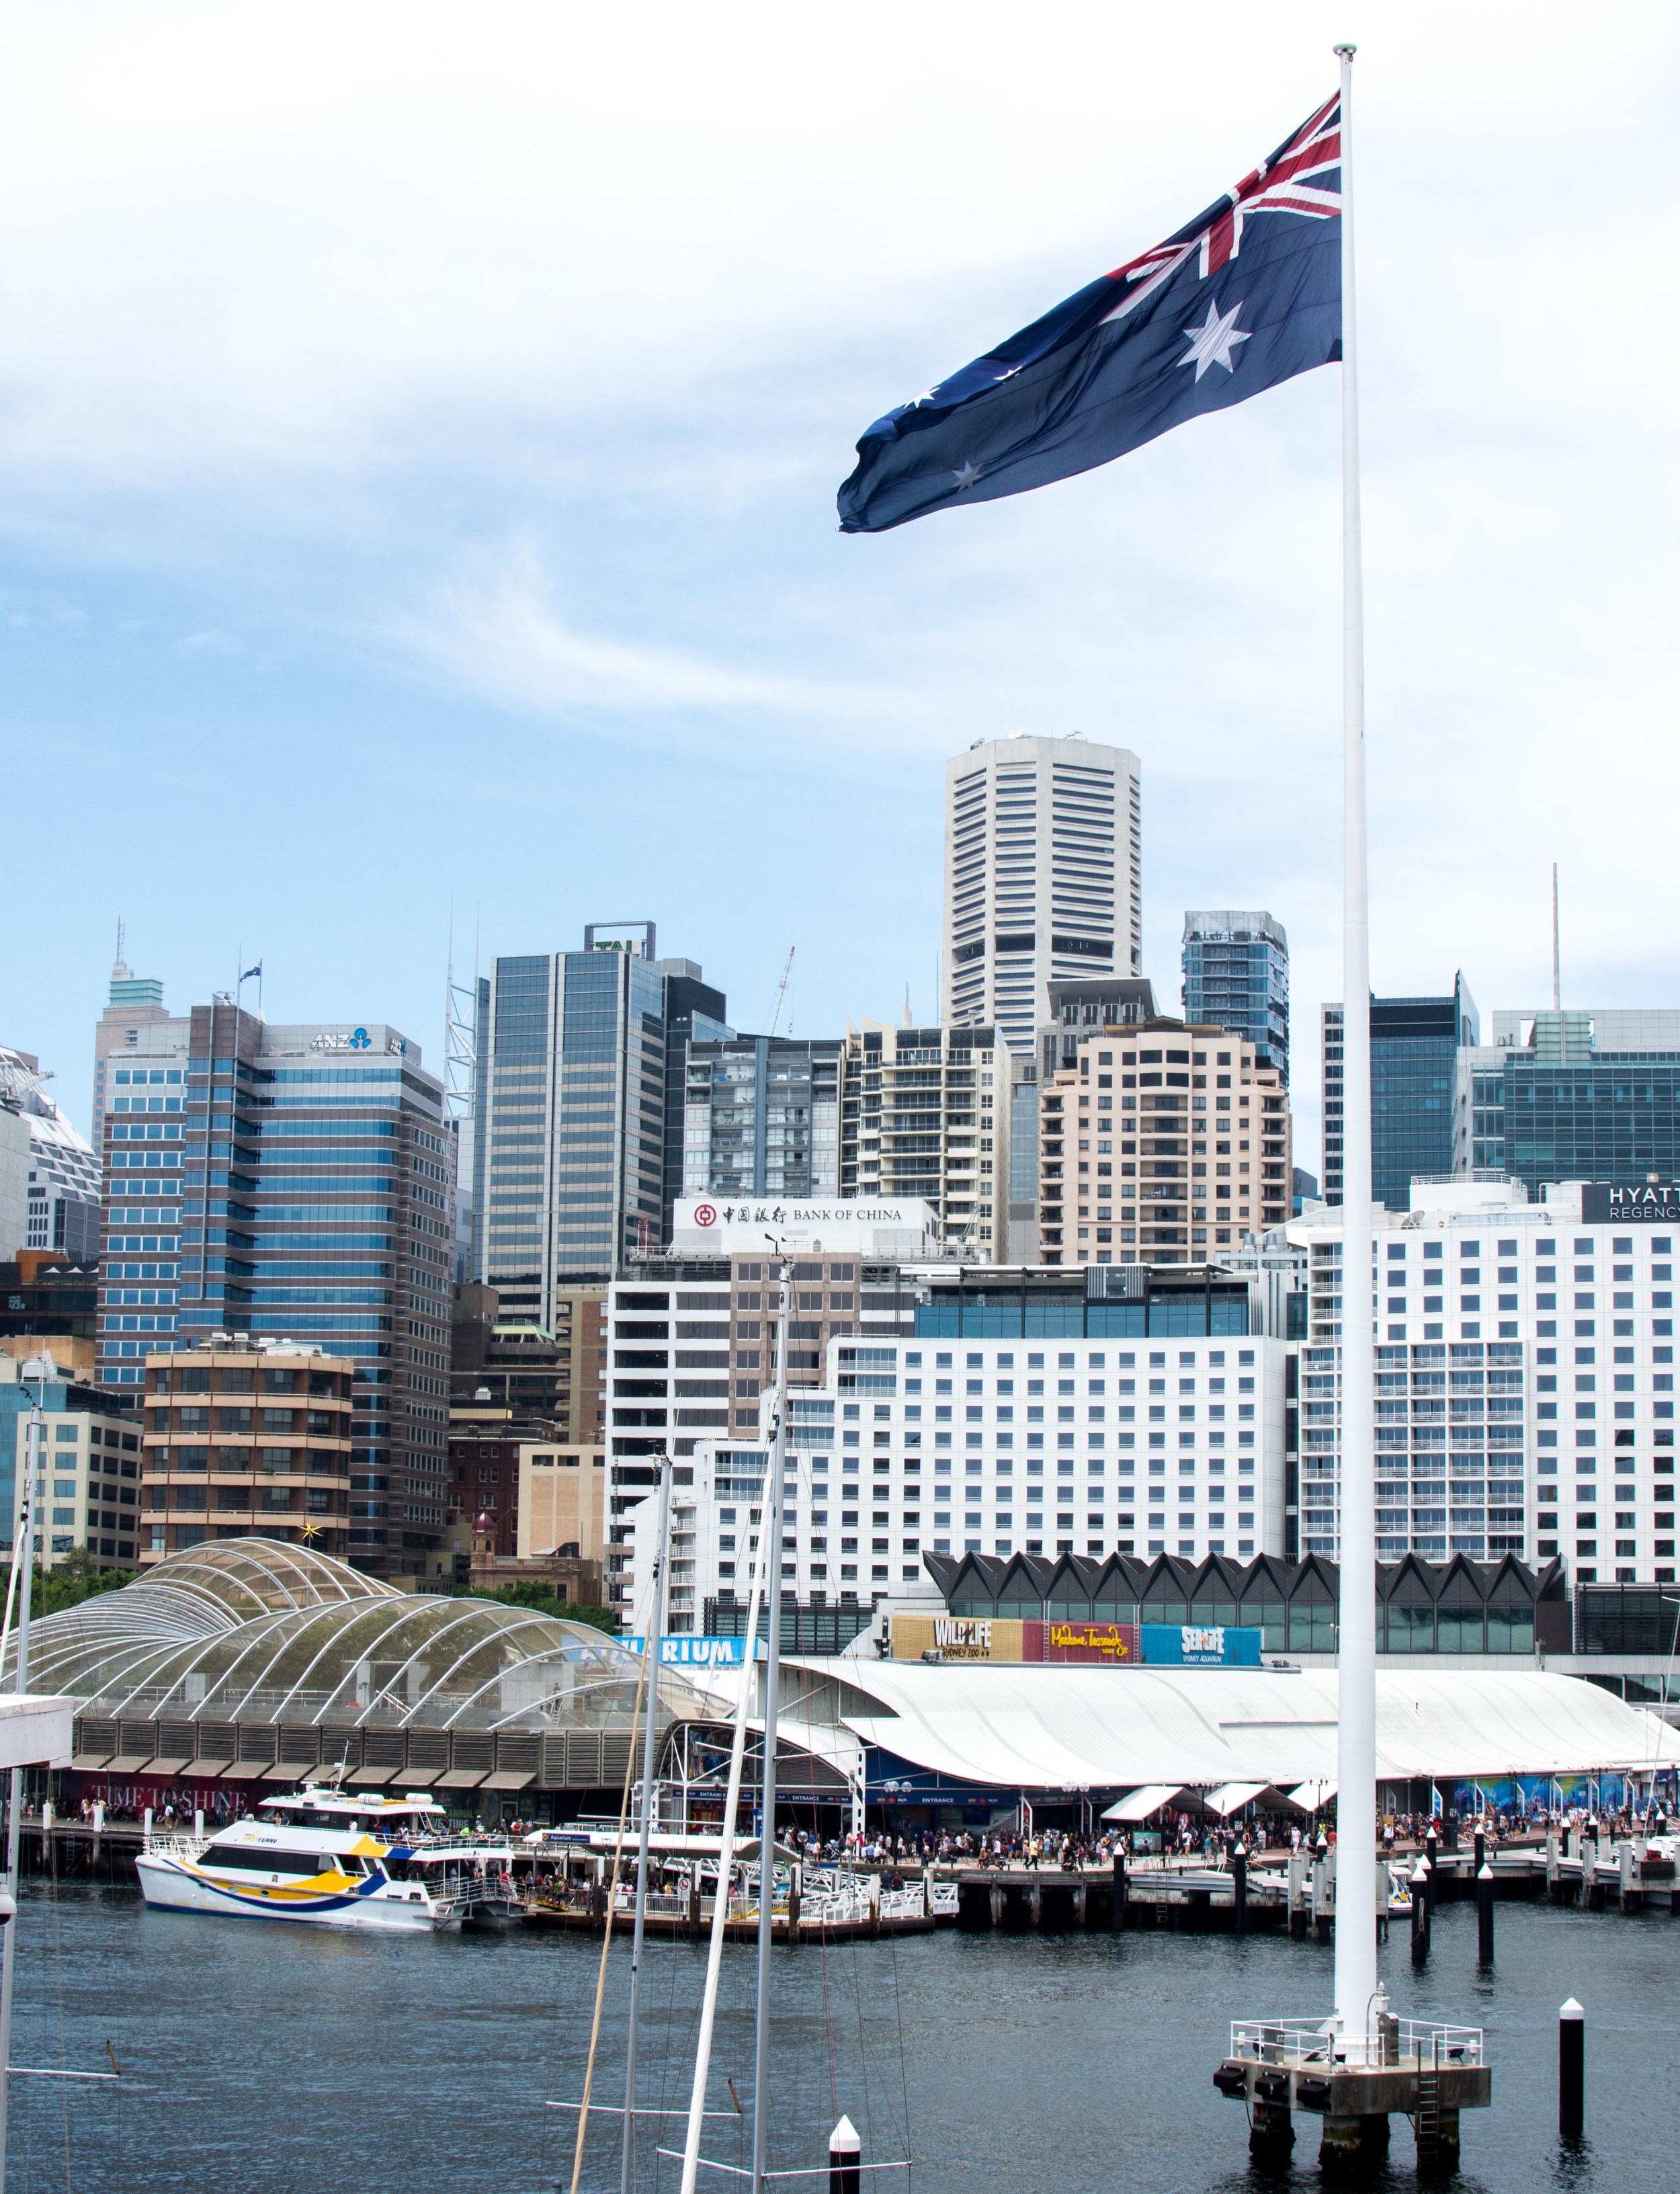 Darling Harbour Neighborhood